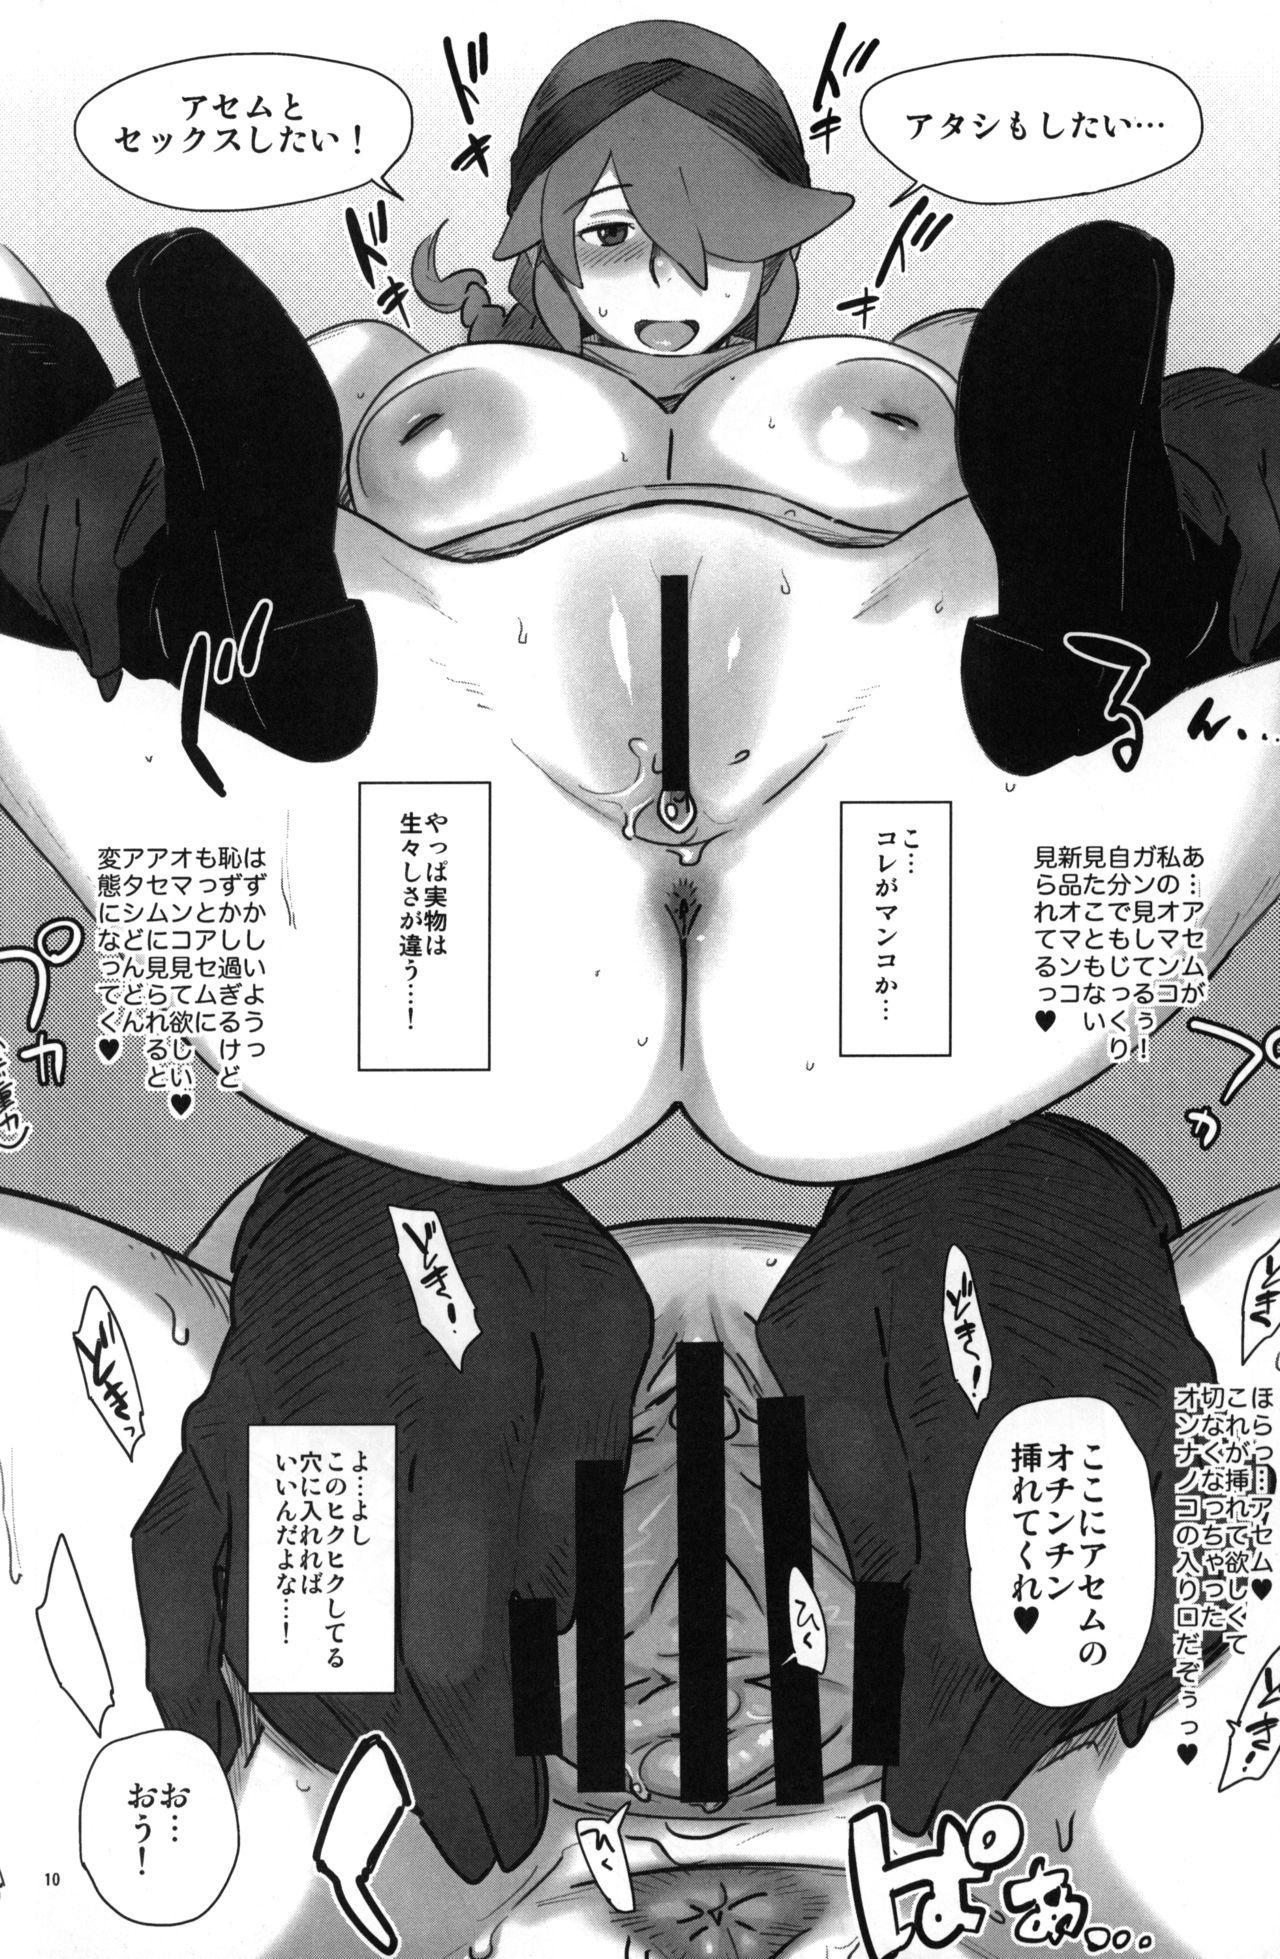 Abradeli Kamitaba No. 11 Otona no GundamAge 2 seX-rounder 8